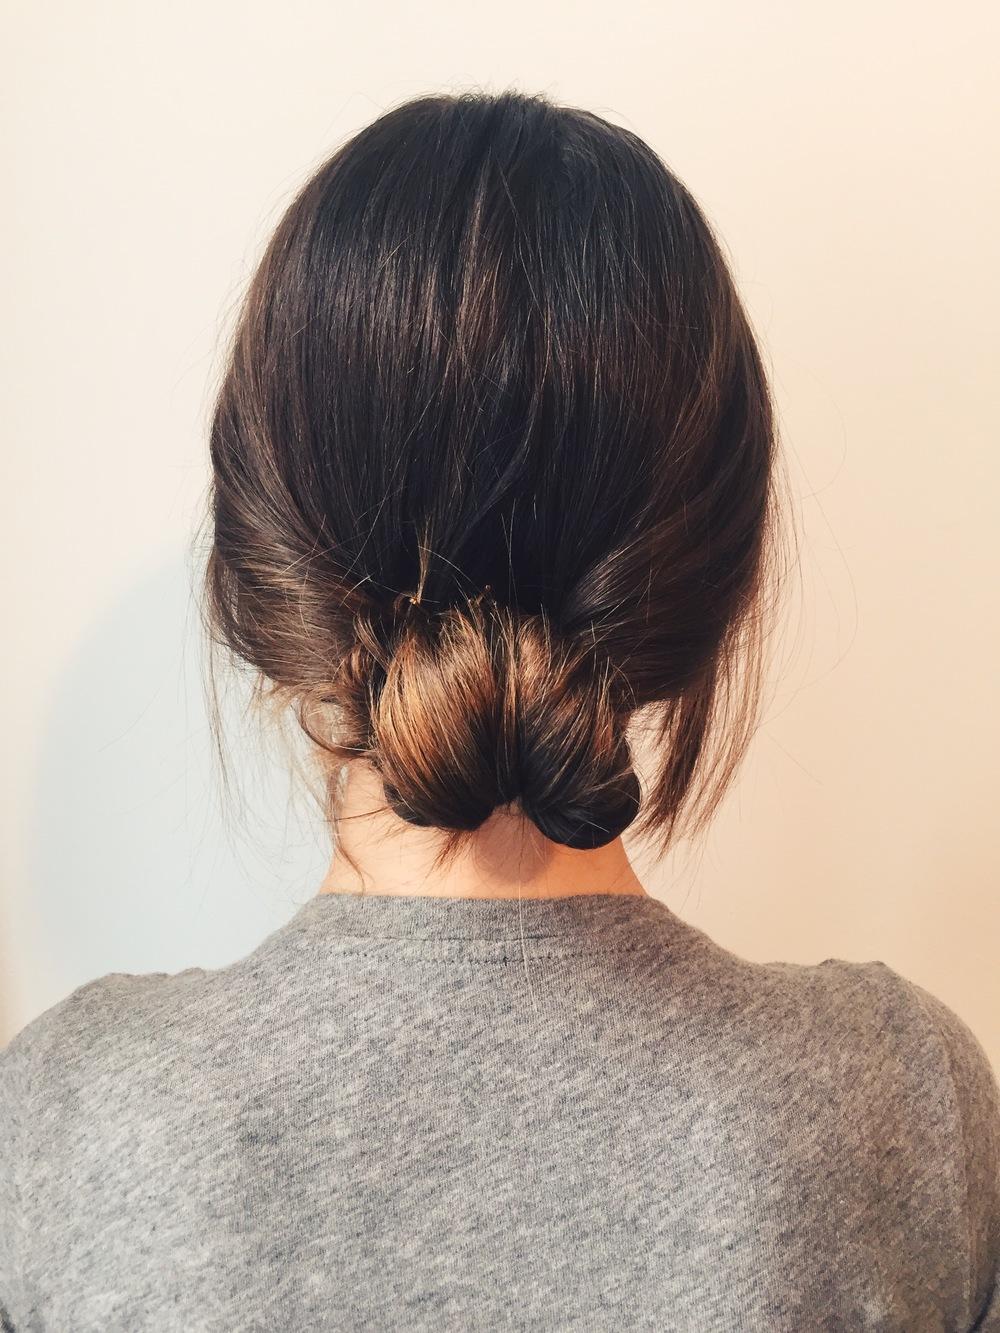 انواع تسريحات شعر 1-6.jpeg